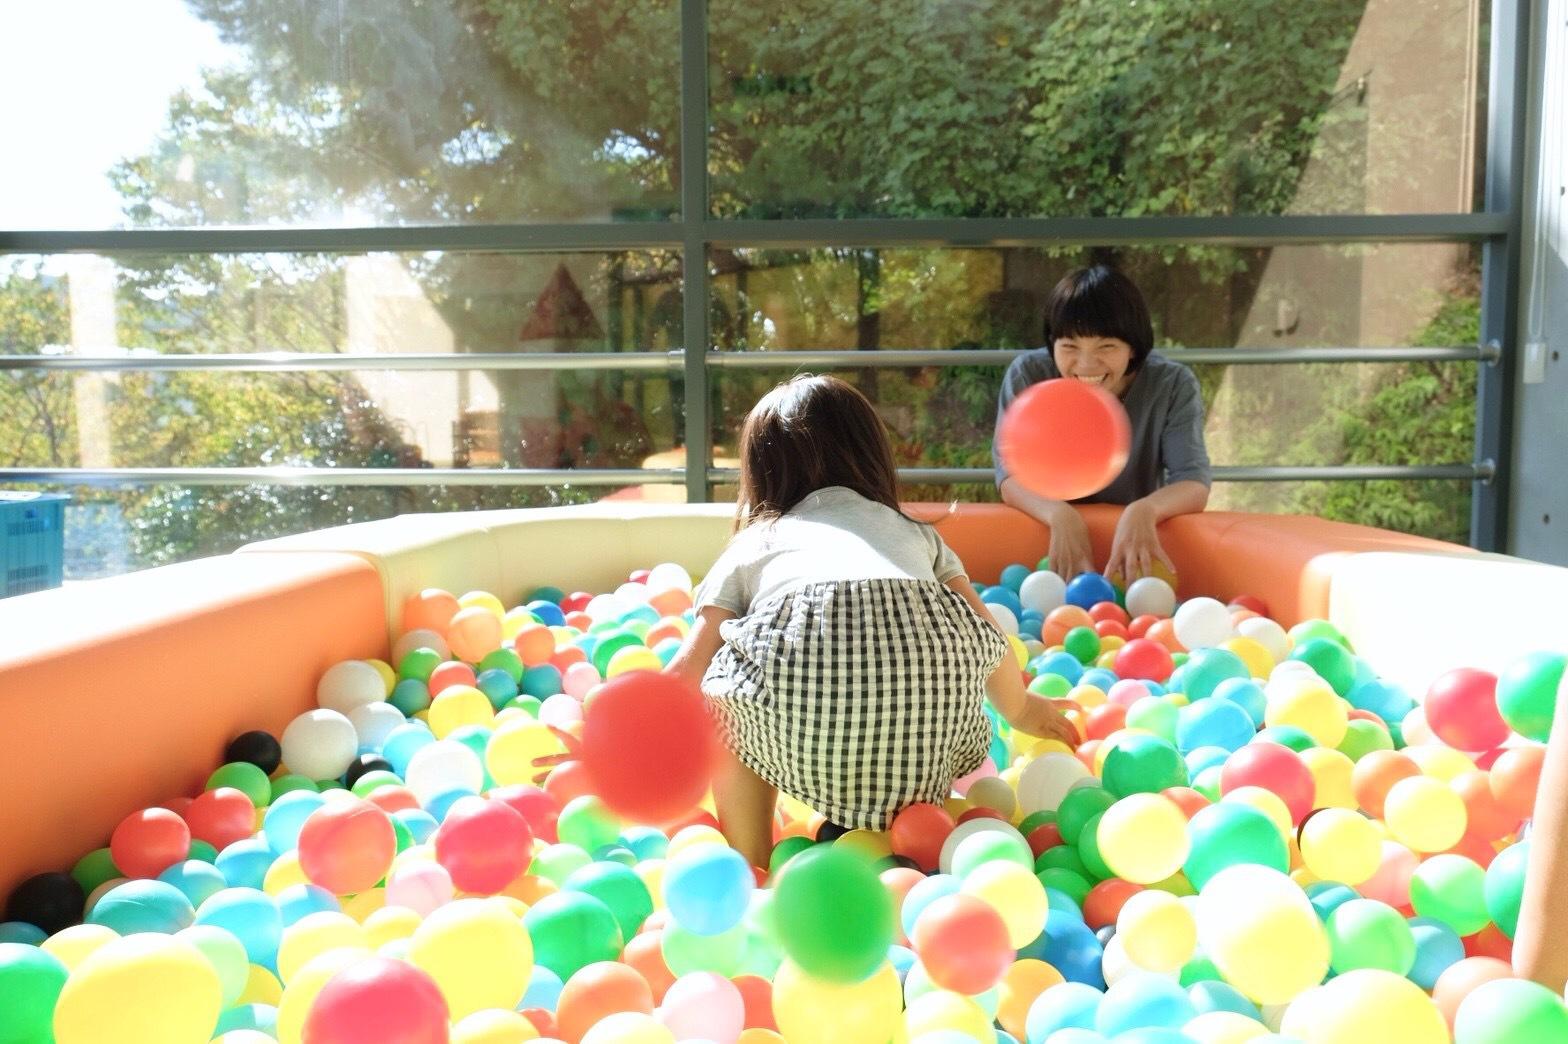 姫路宿泊型児童館 星の子館 image